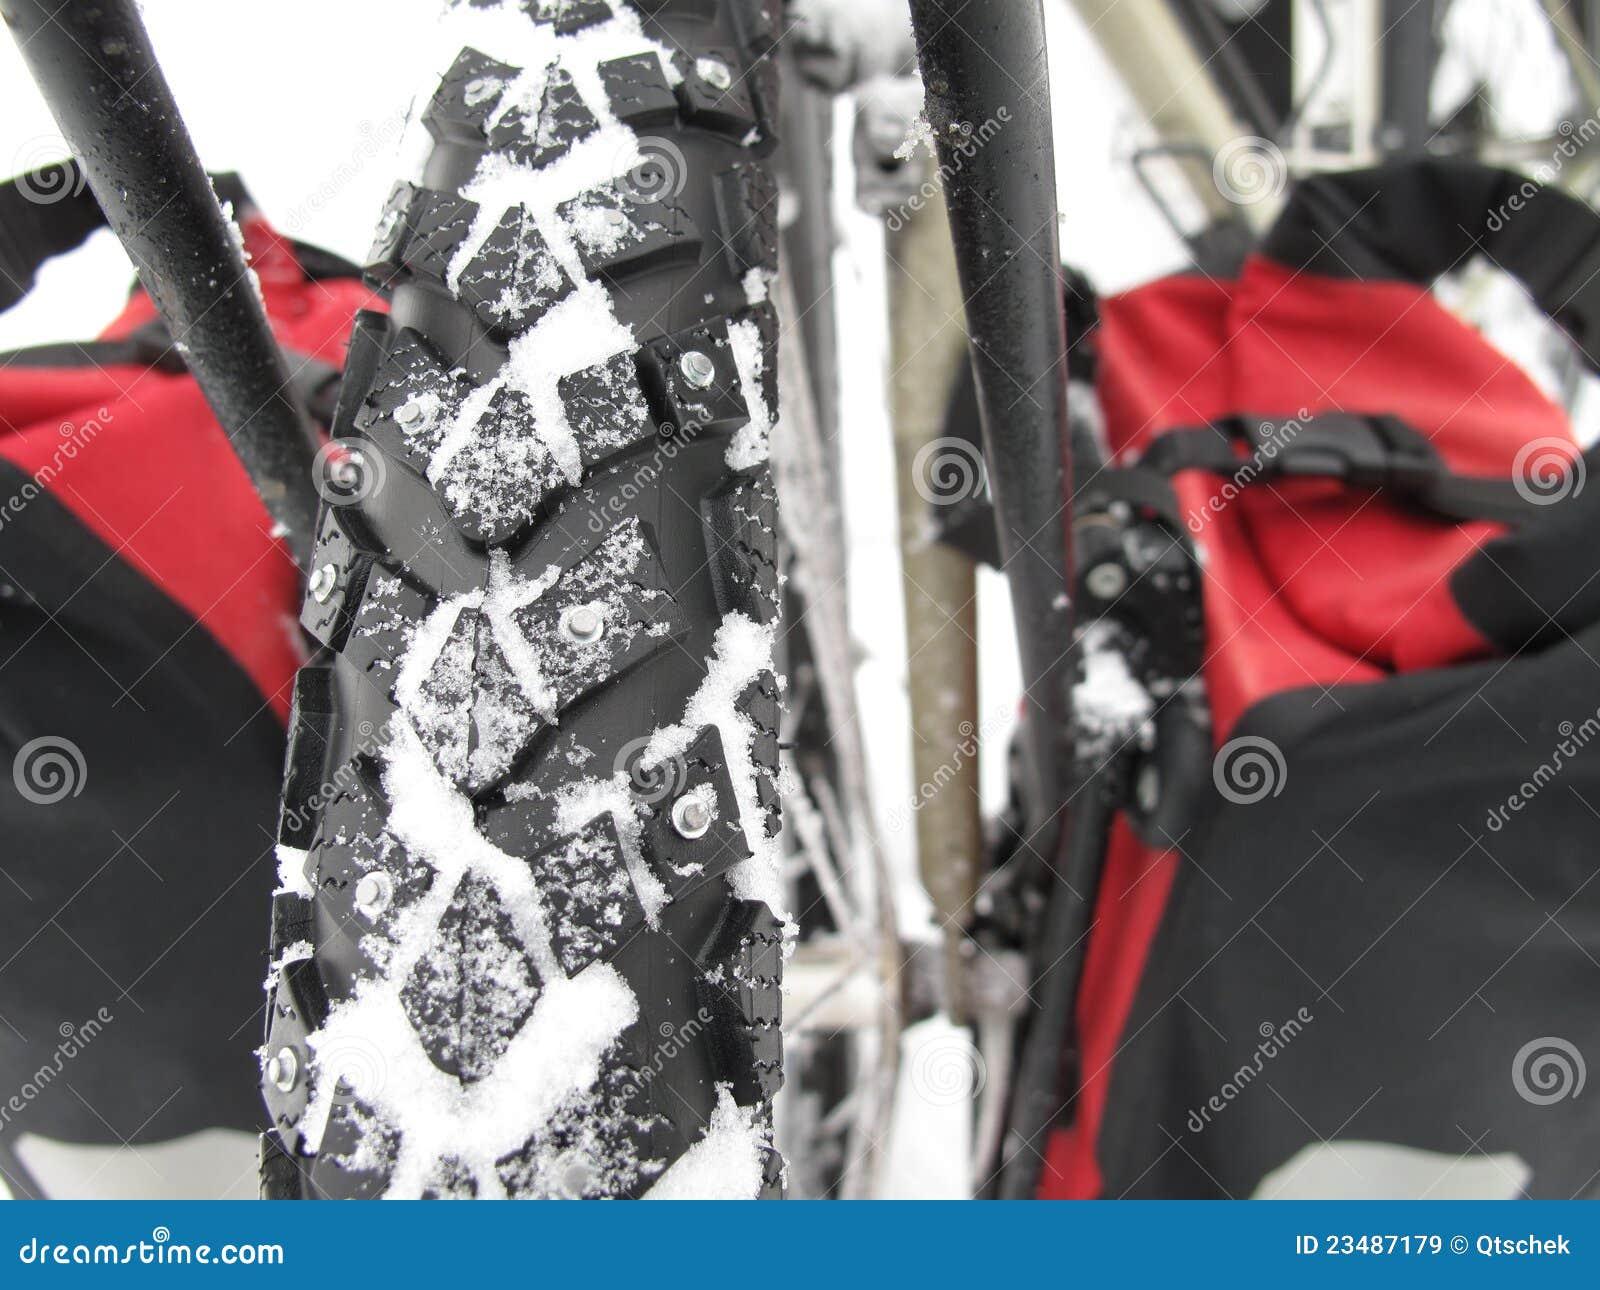 Bicycle snow tires